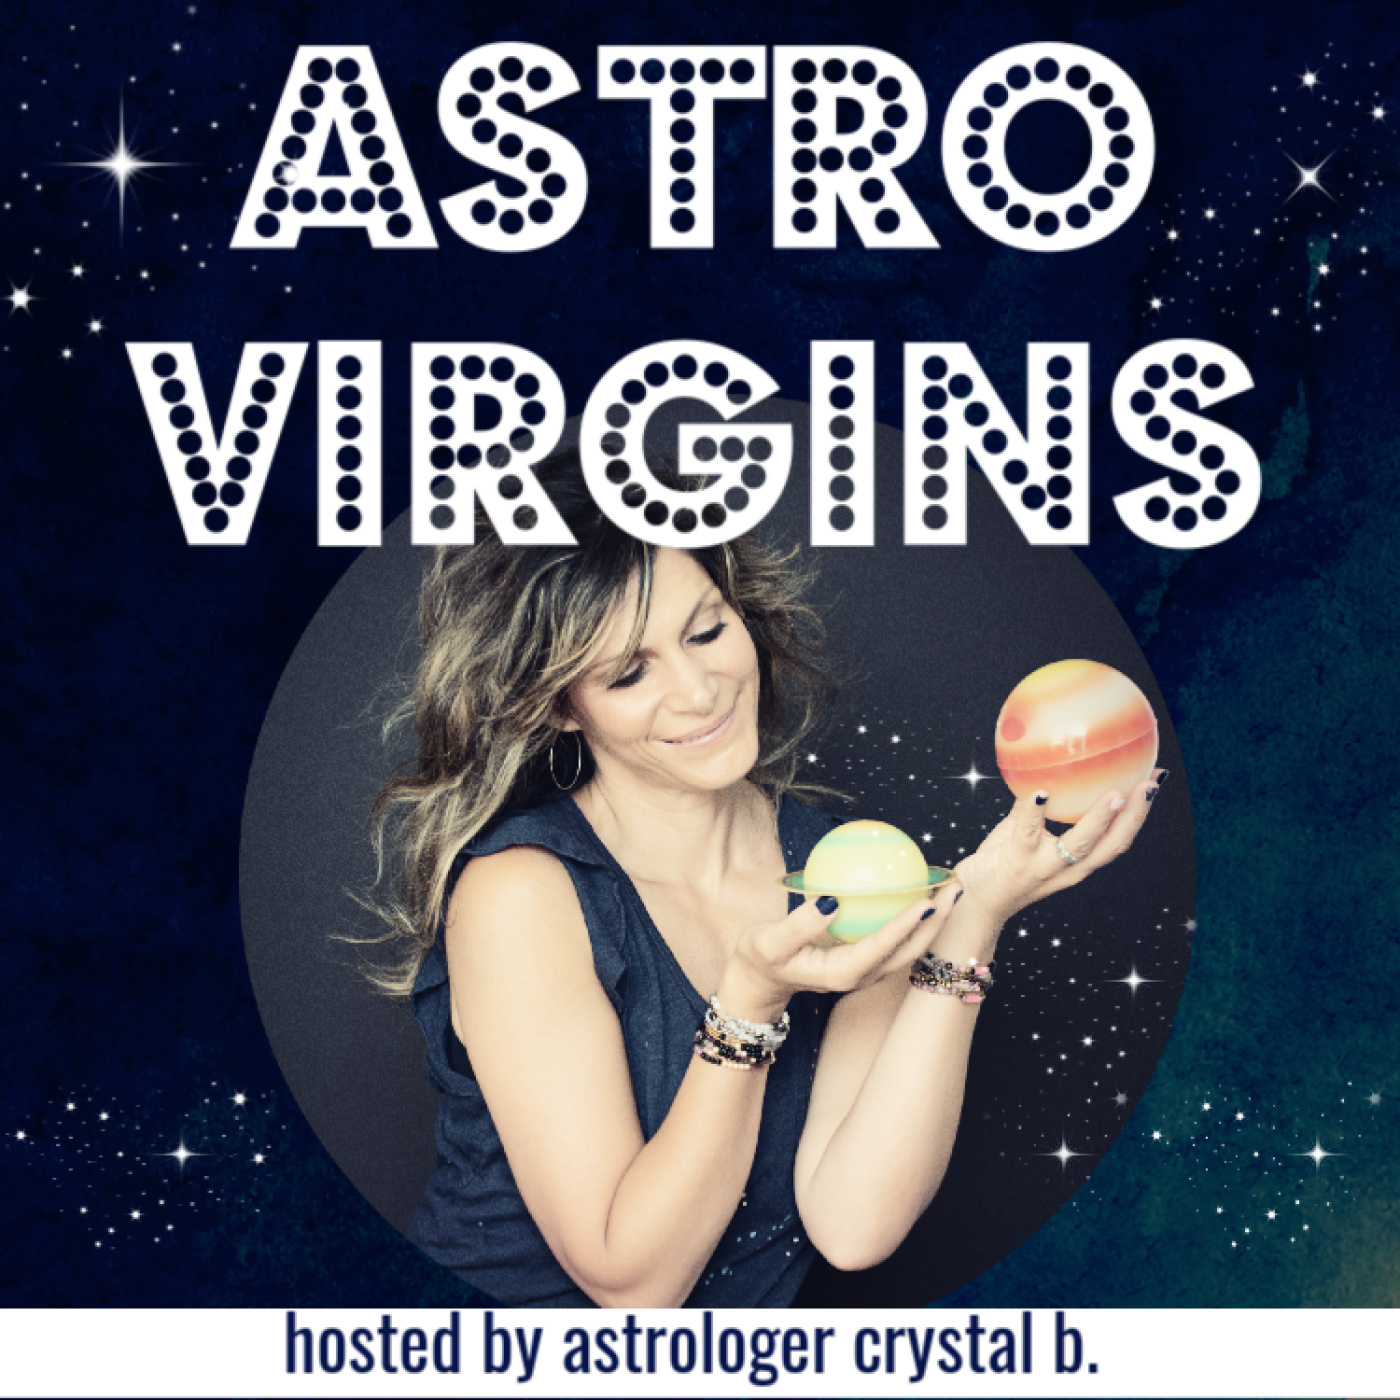 Episode #10: Astrology, Tarot and Saturn show art